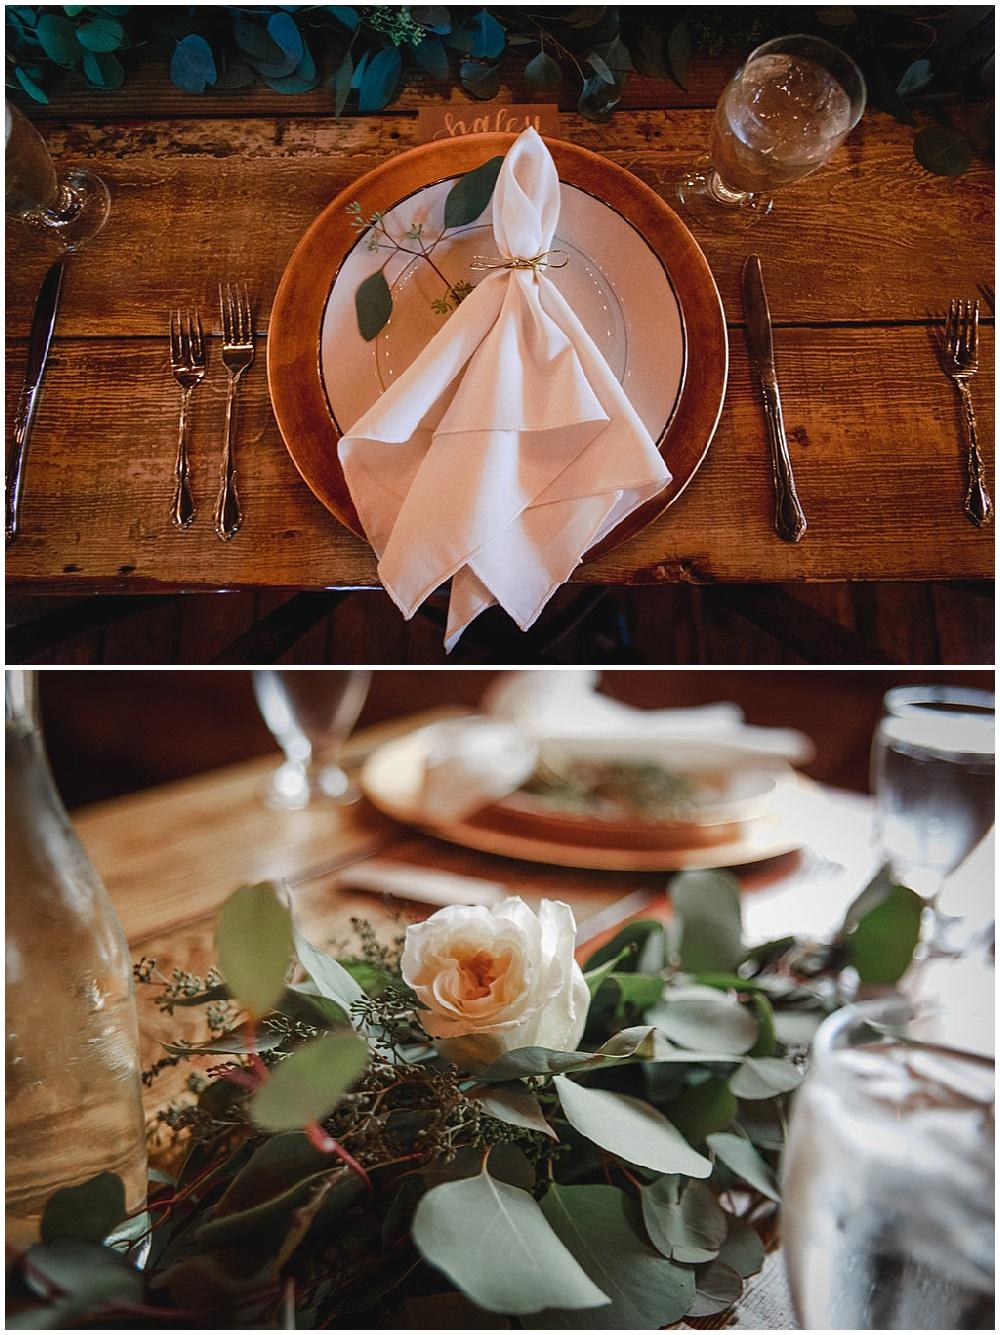 blush table decor with greenery sprigs | Chicago urban rustic wedding| Sandra Armenteros Photography | Jessica Dum Wedding Coordination